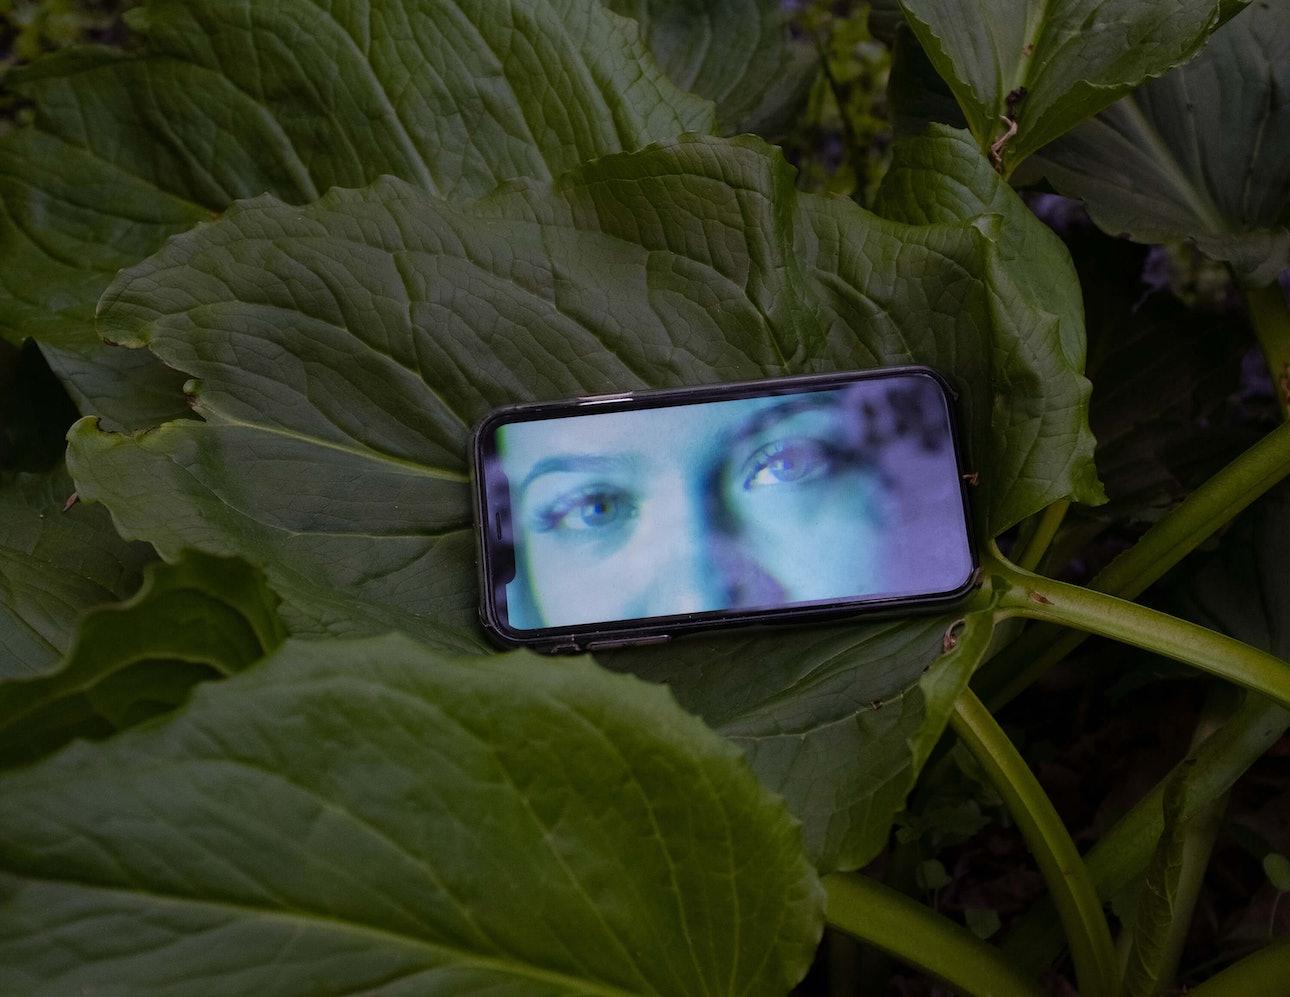 20_ira_lupu_webcam